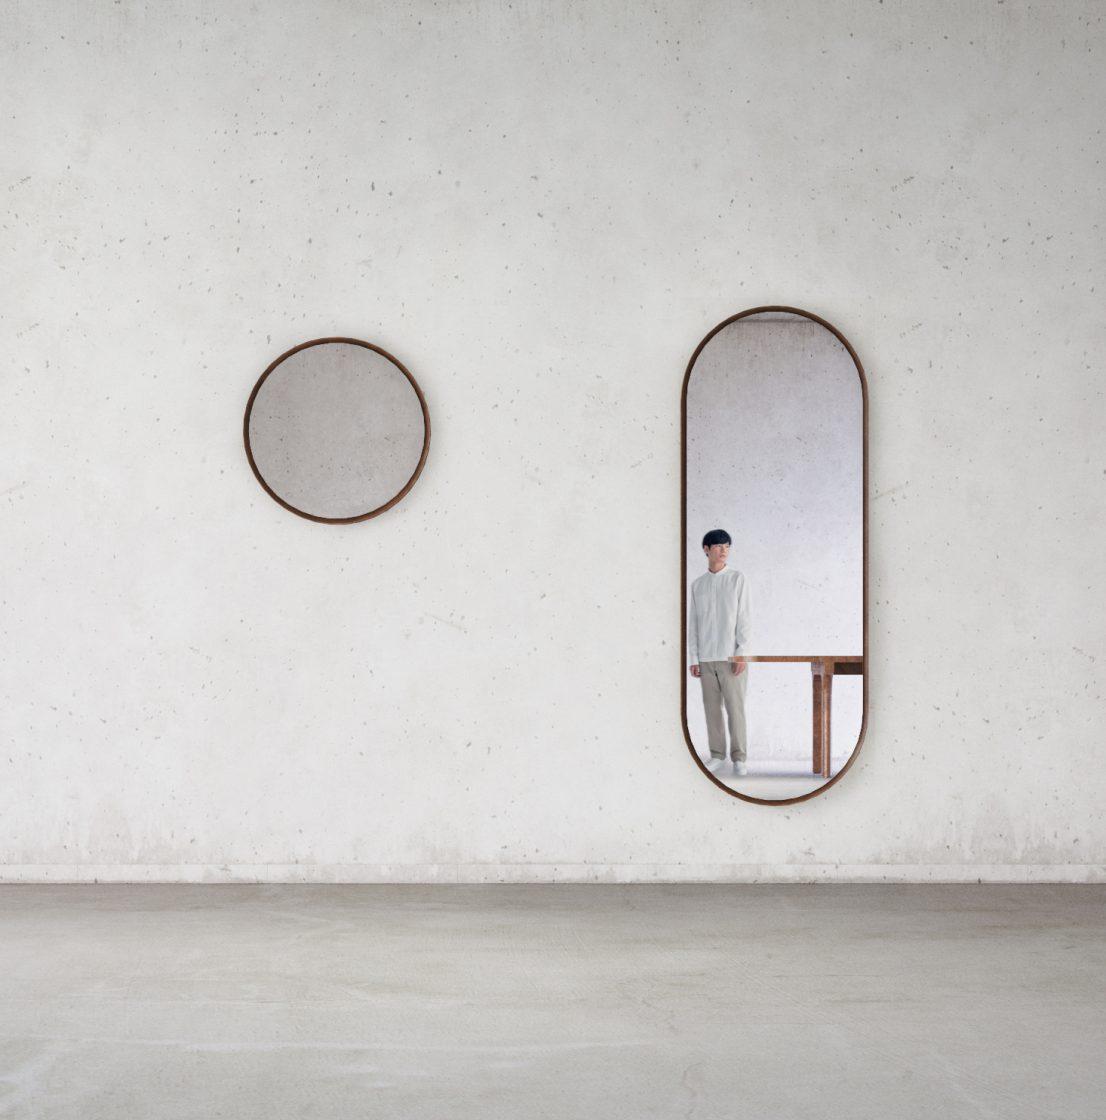 METROOBJETOS espelhos